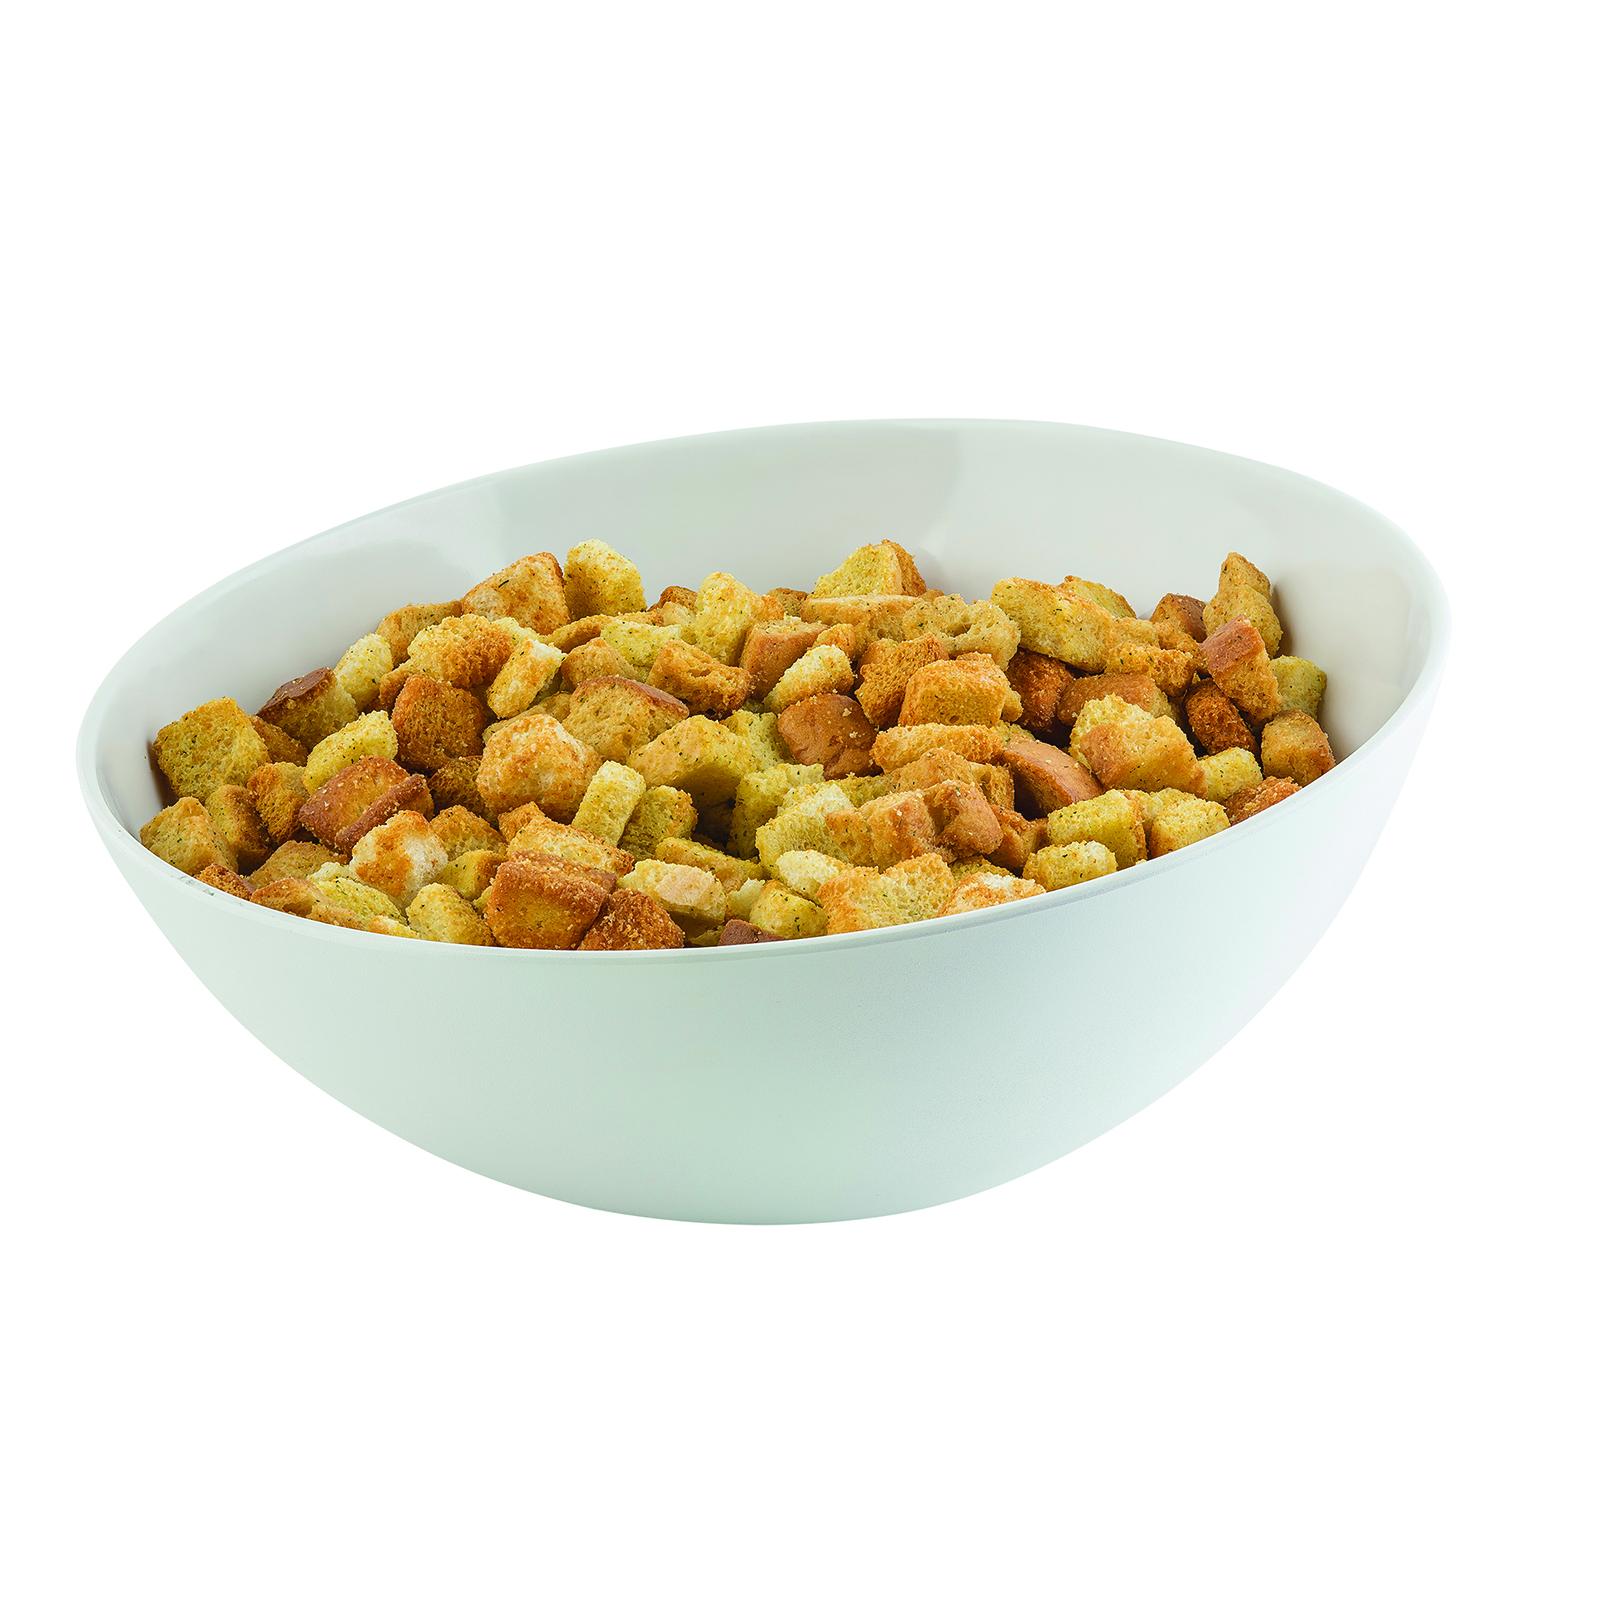 TableCraft Products M4092WH bowl, plastic,  3 - 4 qt (96 - 159 oz)